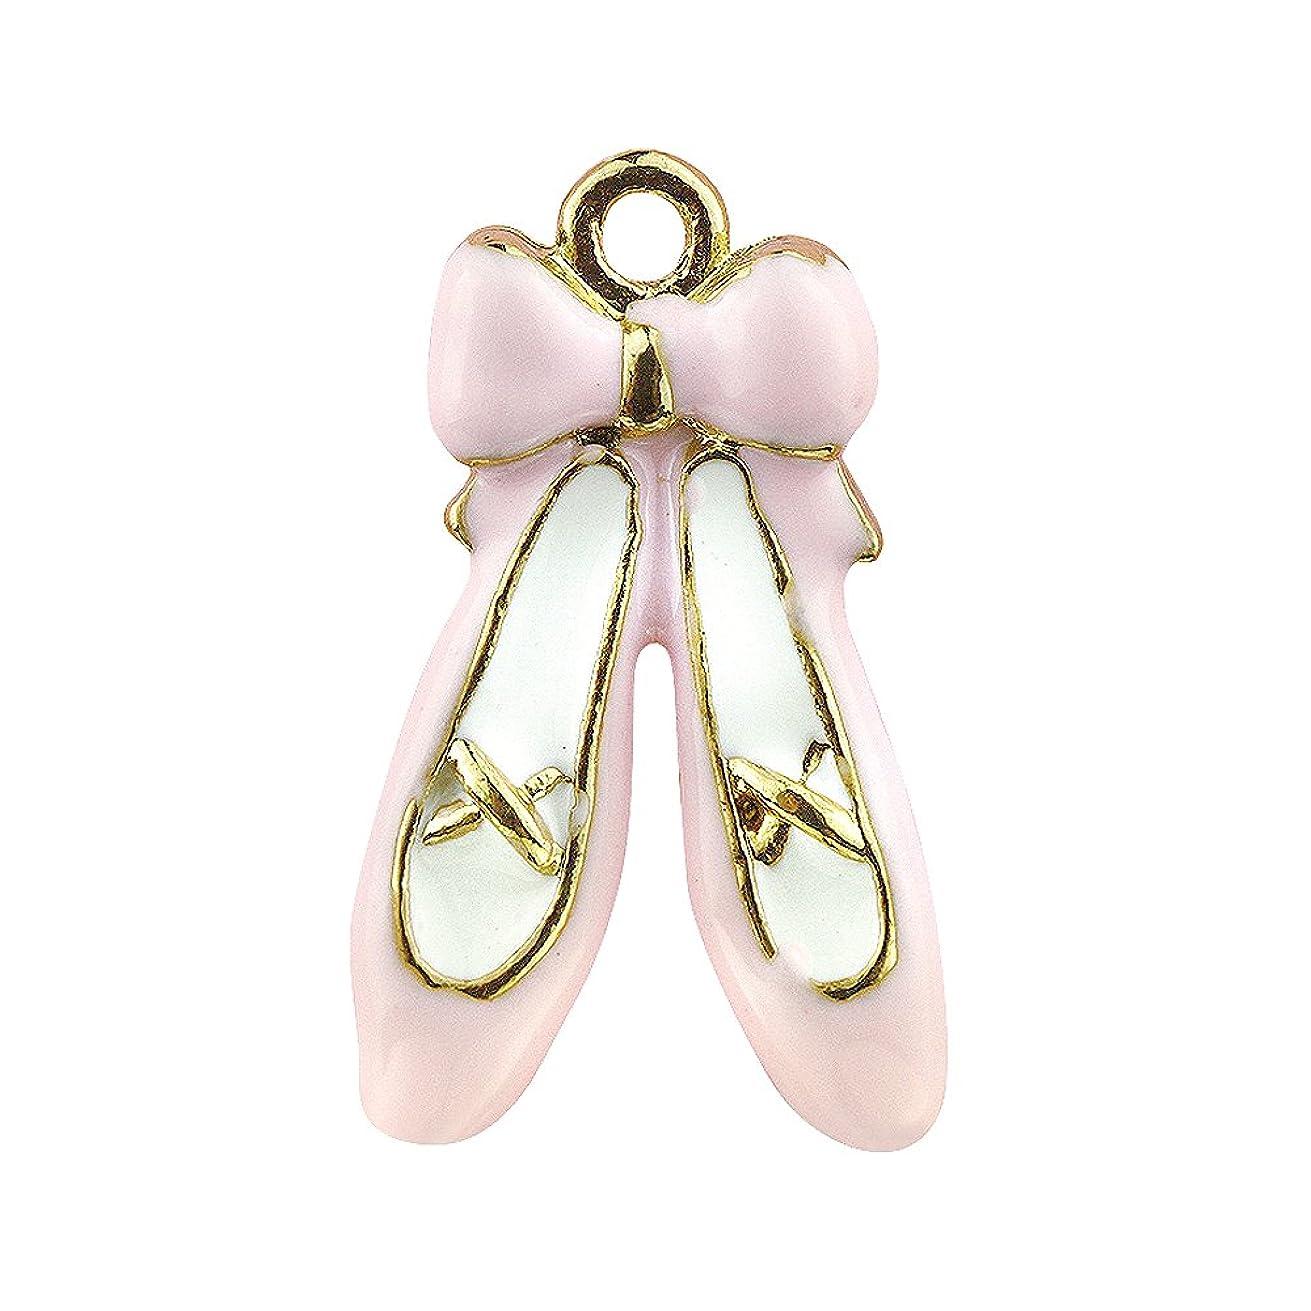 Creative DIY Pink Ballet Shoe Charms Pendants Wholesale (Set of 3) MH238